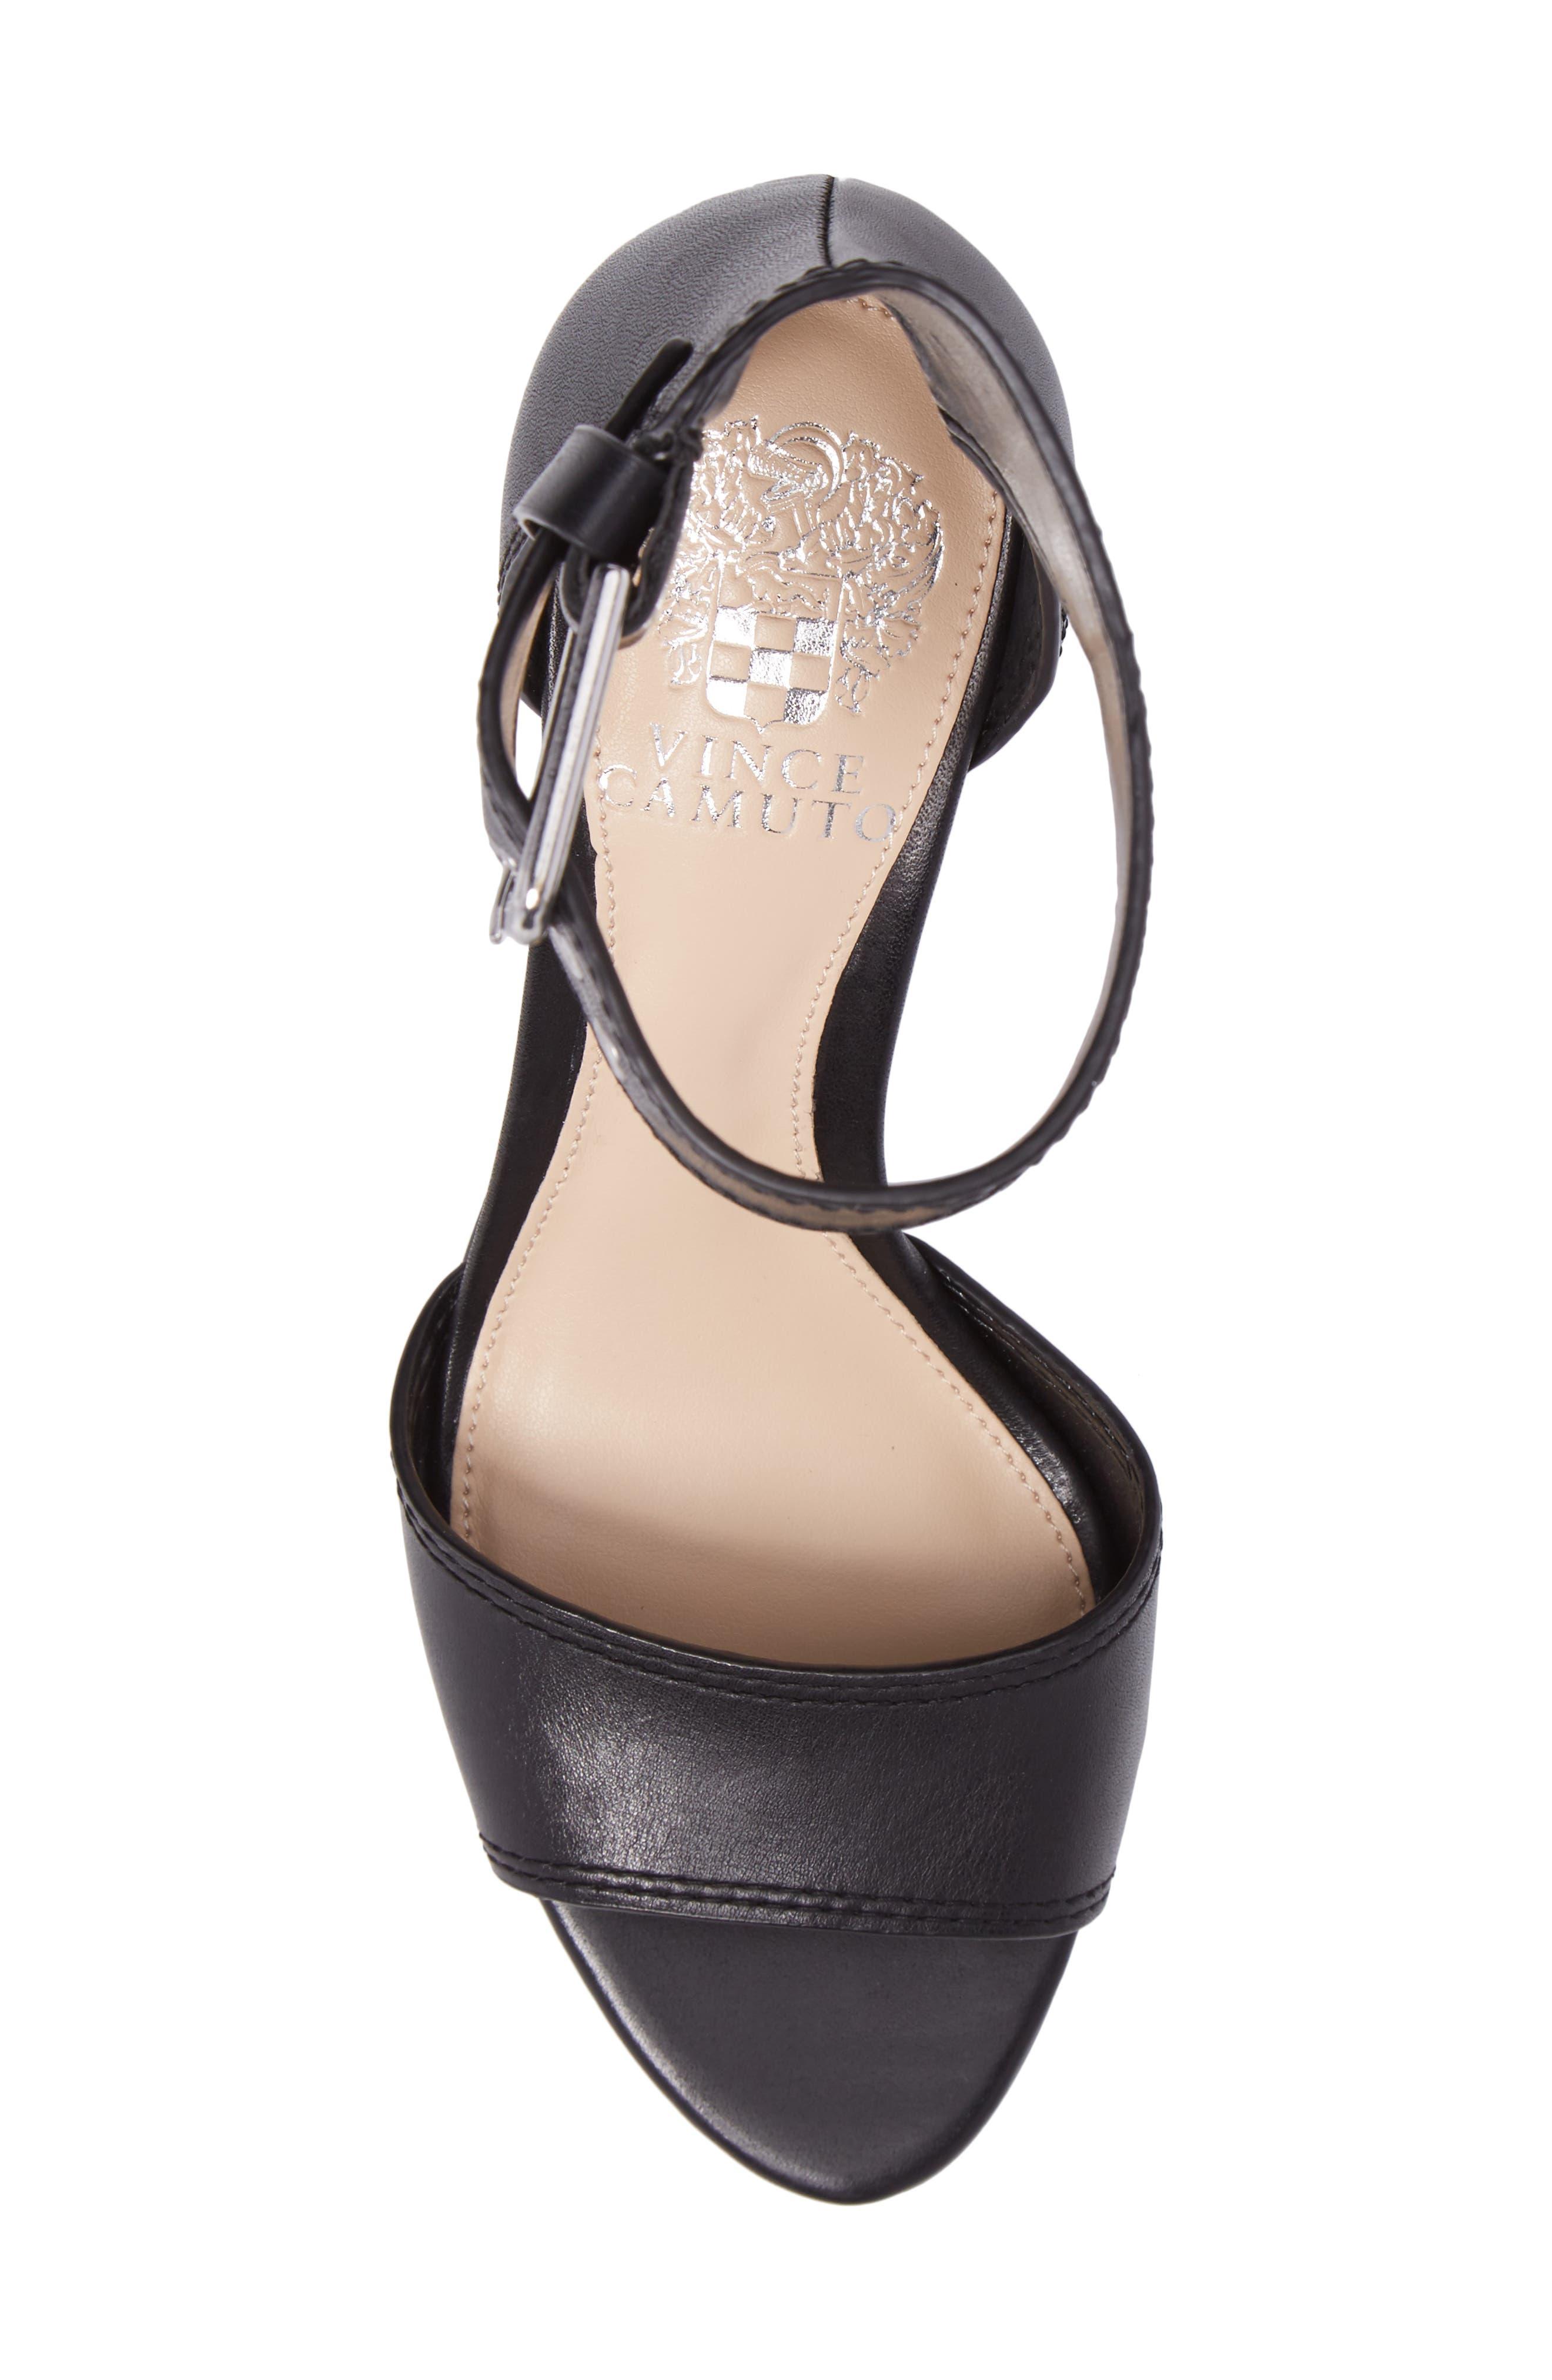 Driton Ankle Strap Sandal,                             Alternate thumbnail 5, color,                             Black Leather